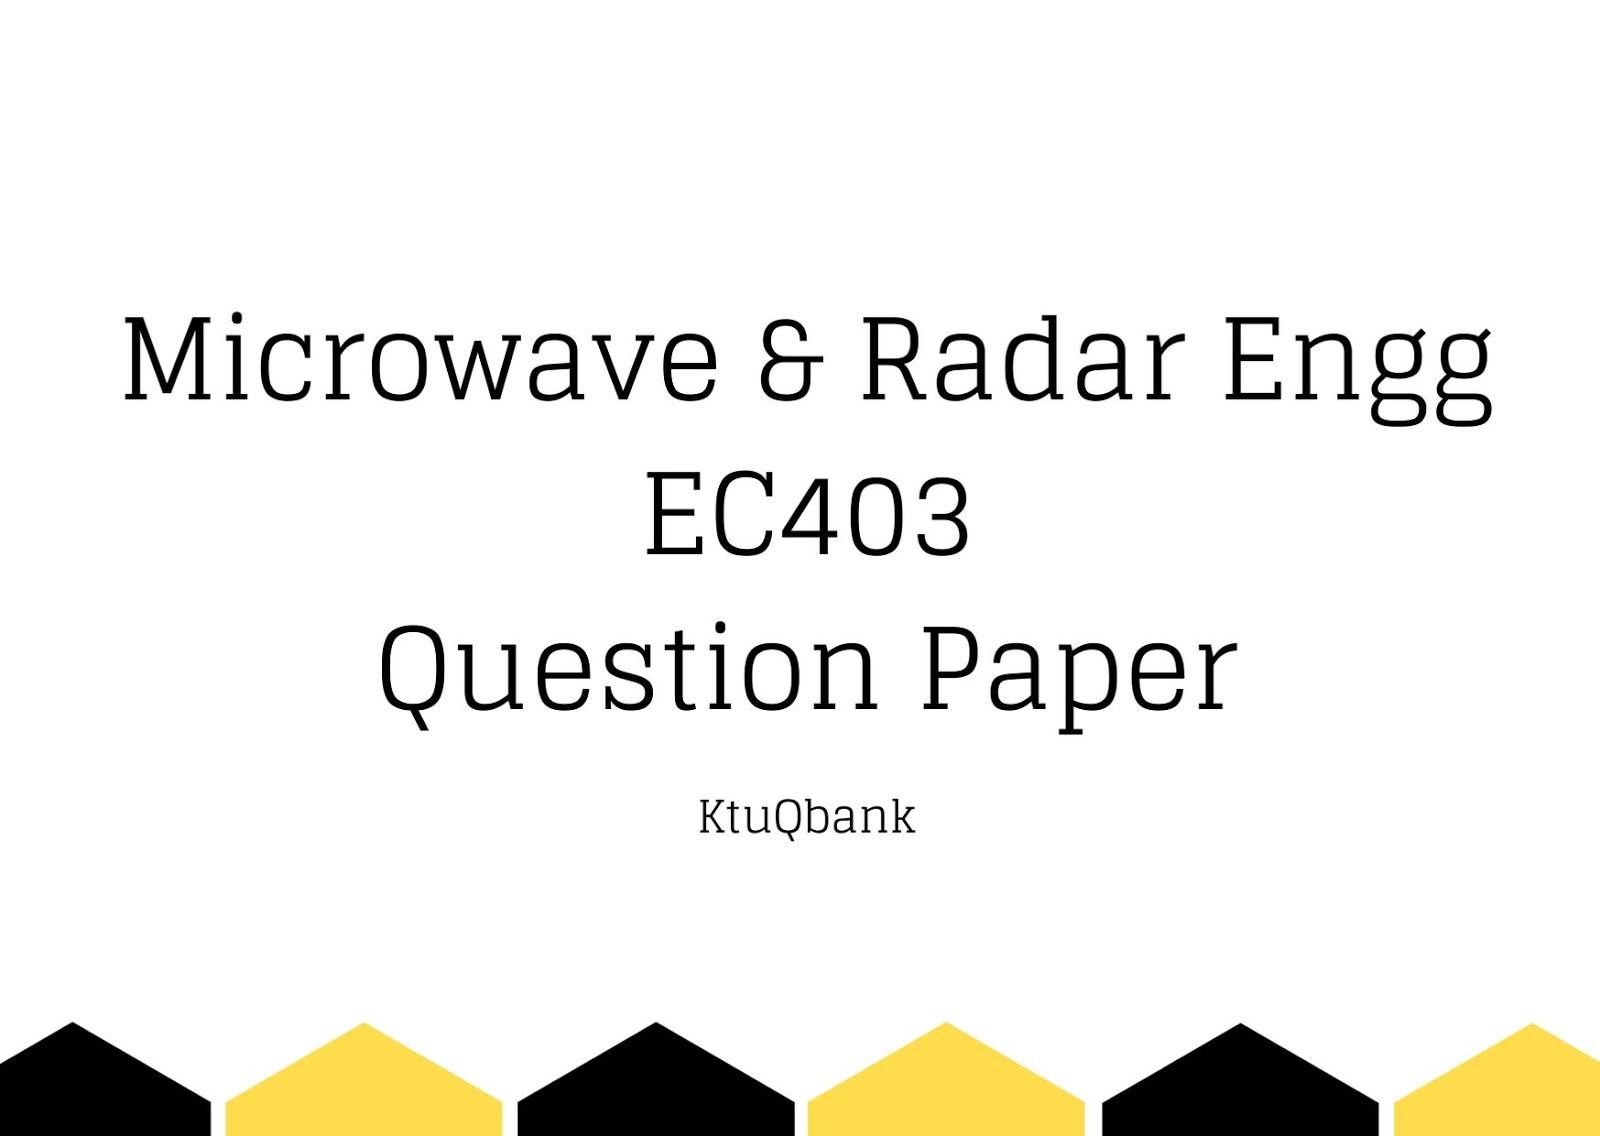 Microwave & Radar Engg | EC403 | Question Papers (2015 batch)